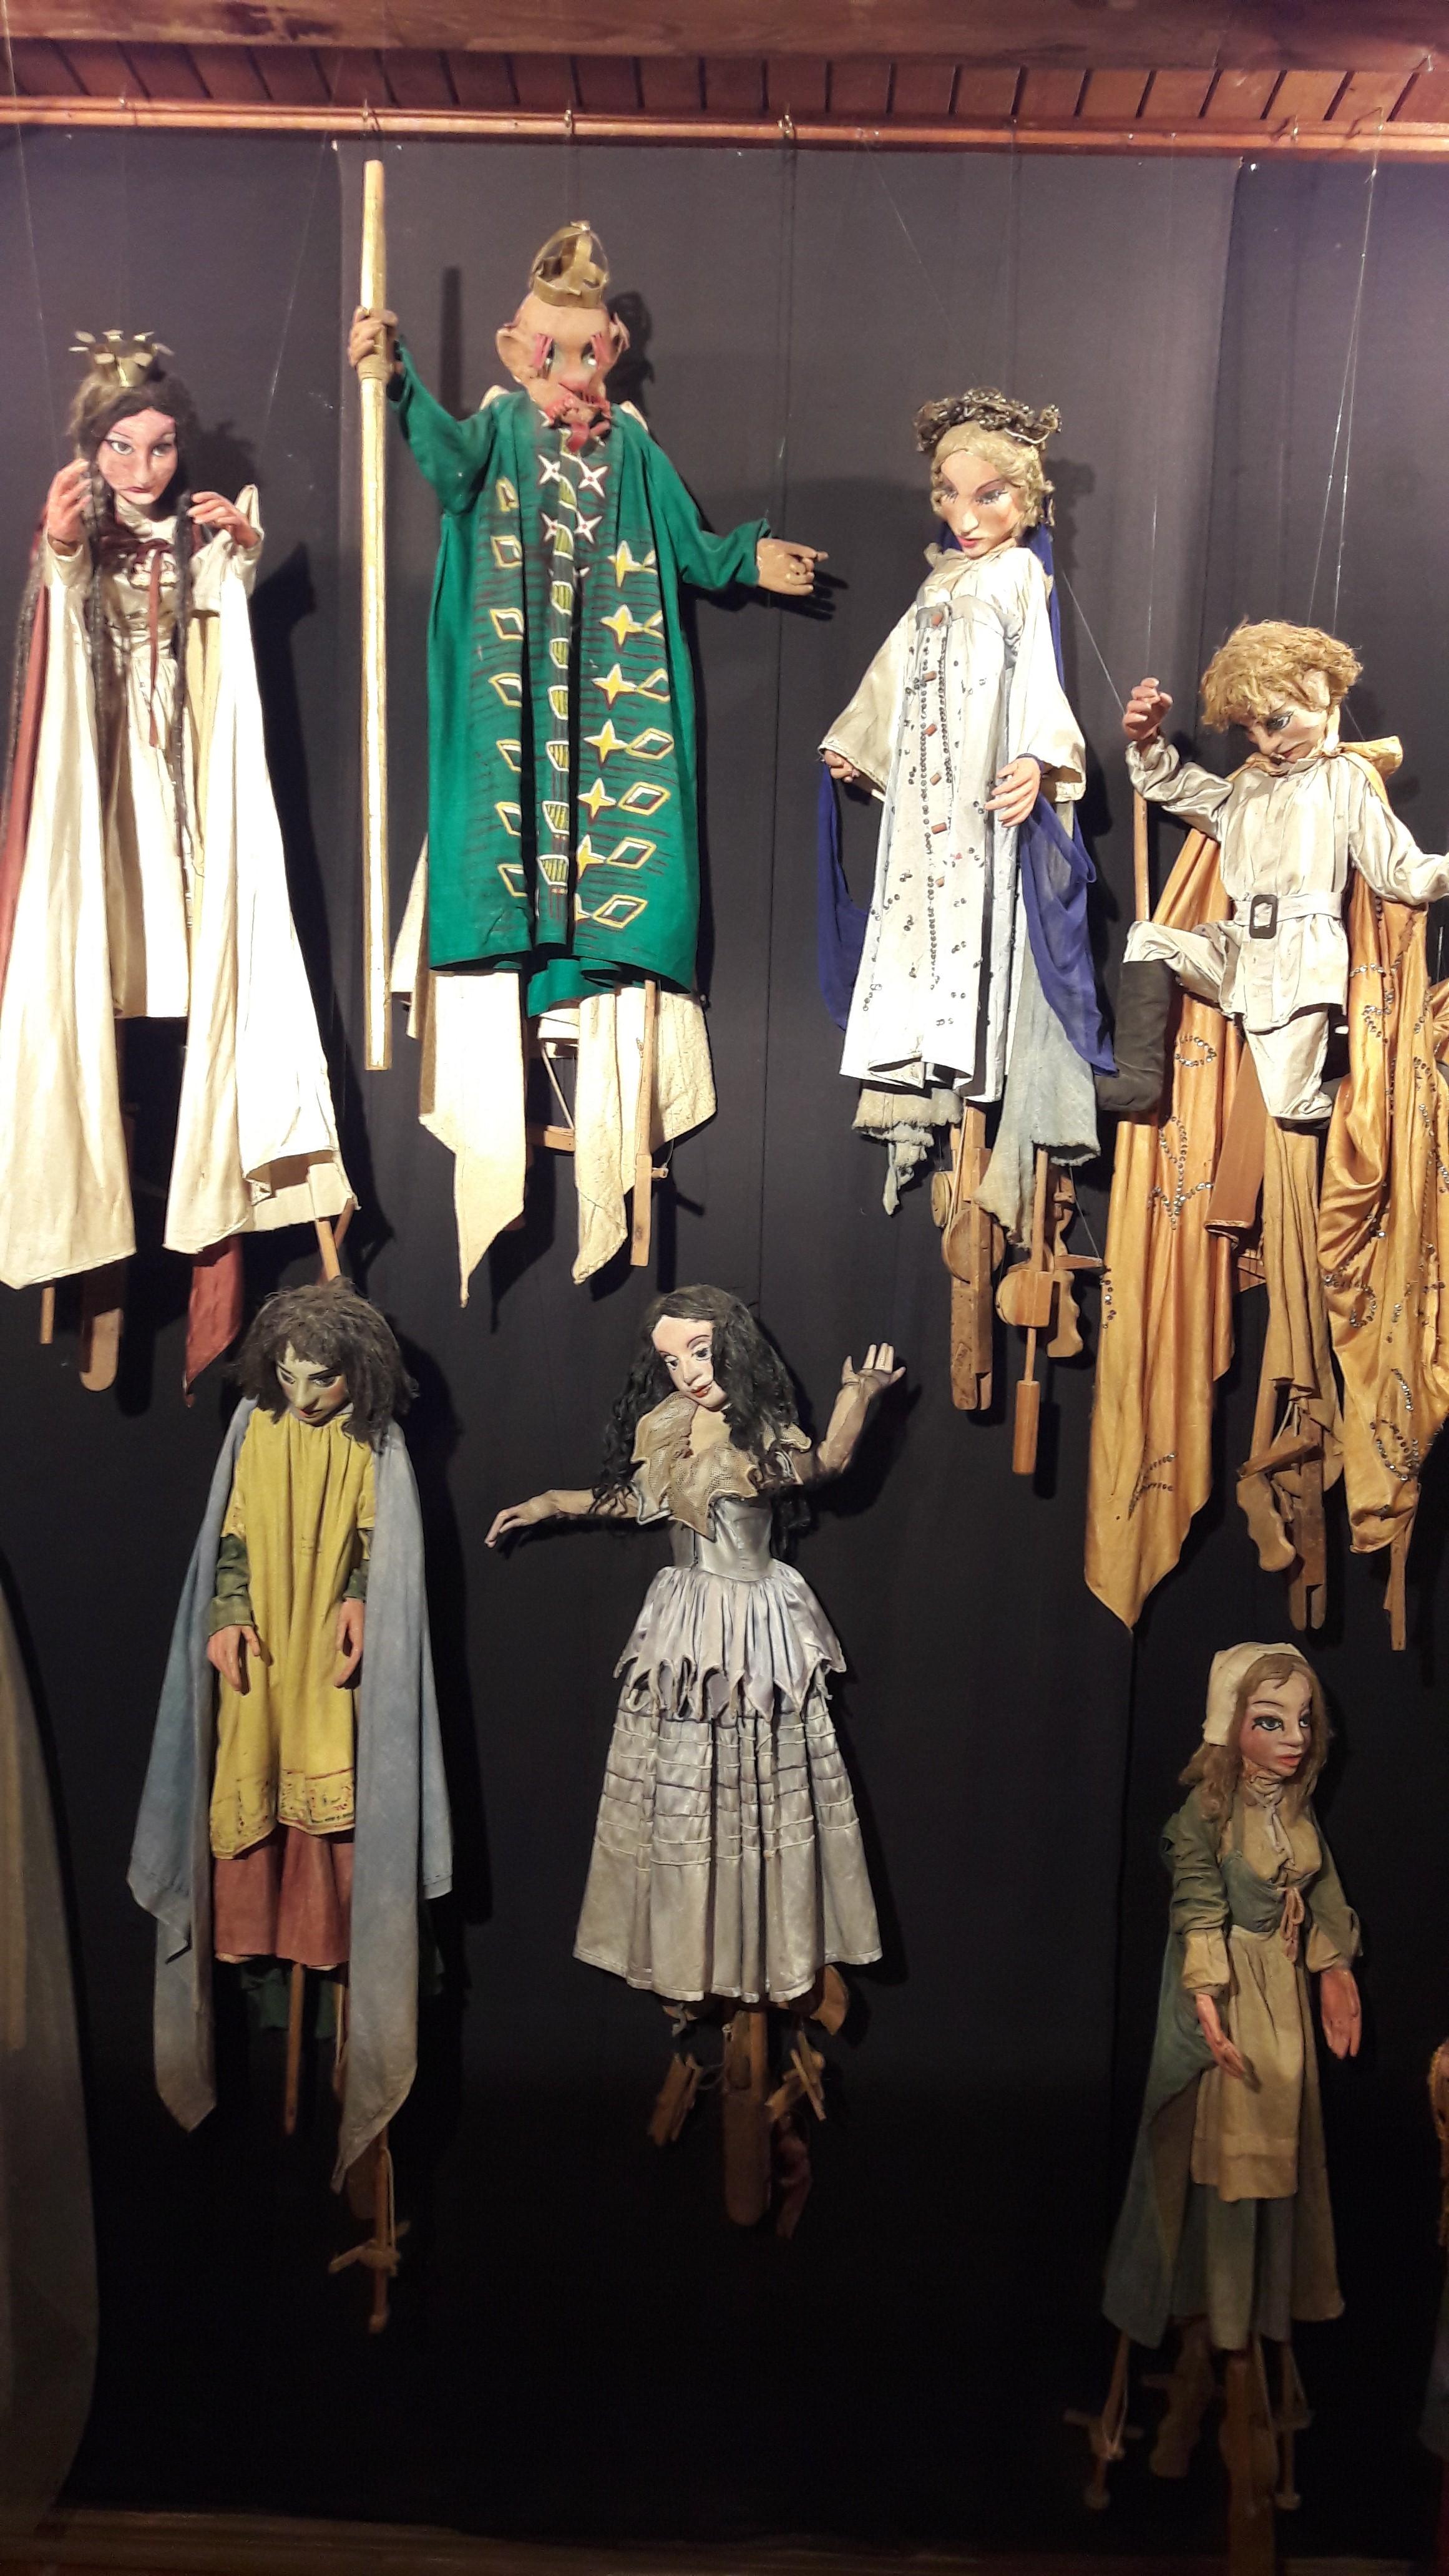 Puppets of Saravanov